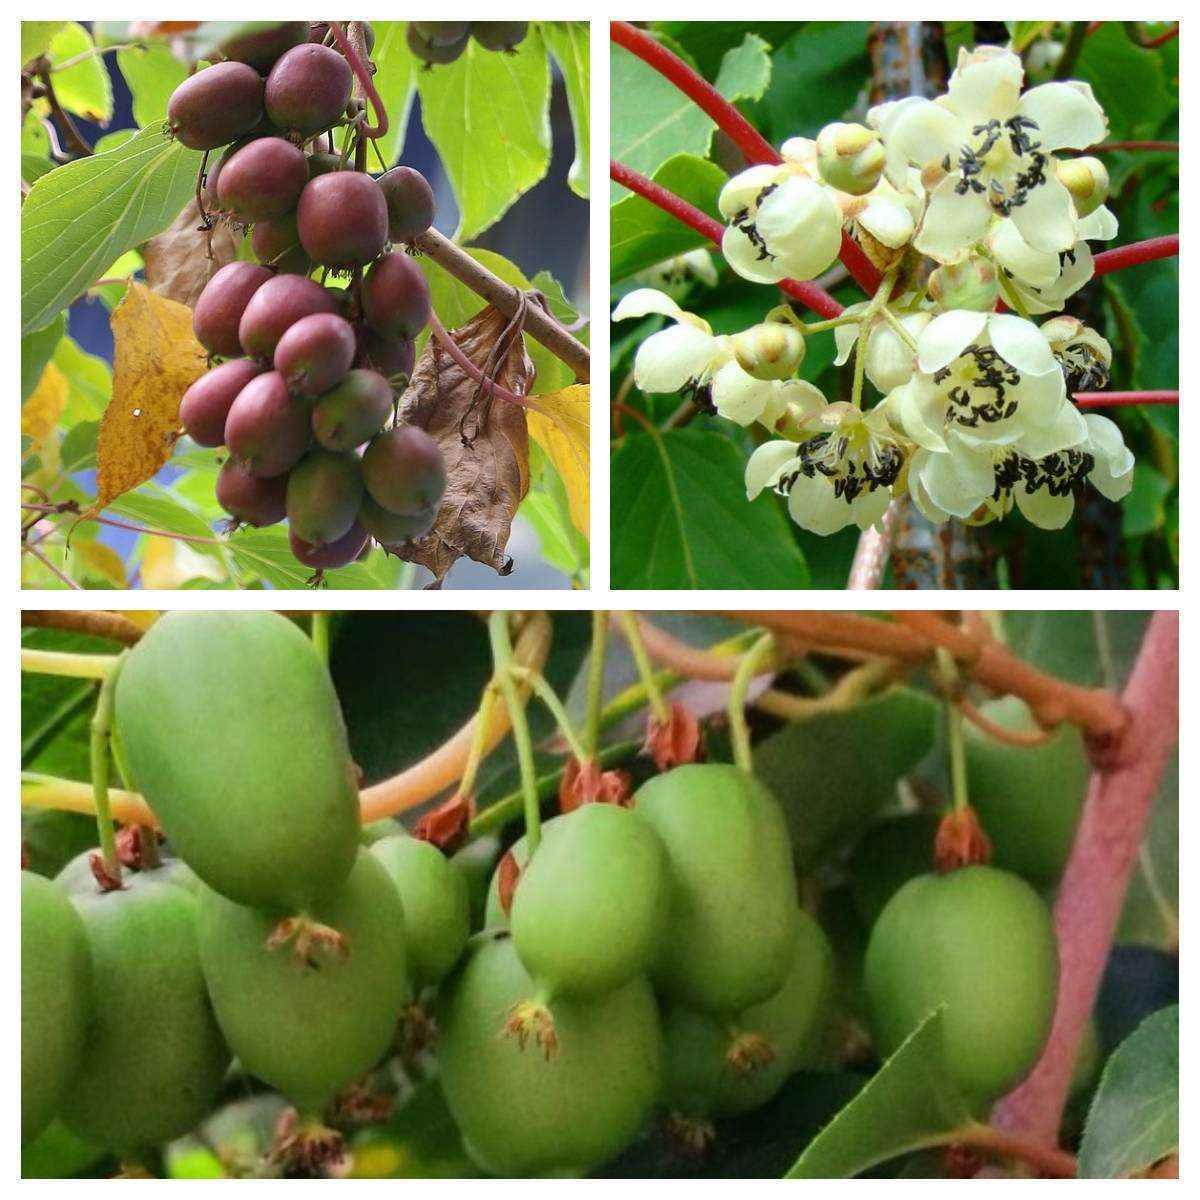 Confezione da 3 kiwi arguta in variet vivai veimaro for Pianta kiwi prezzo